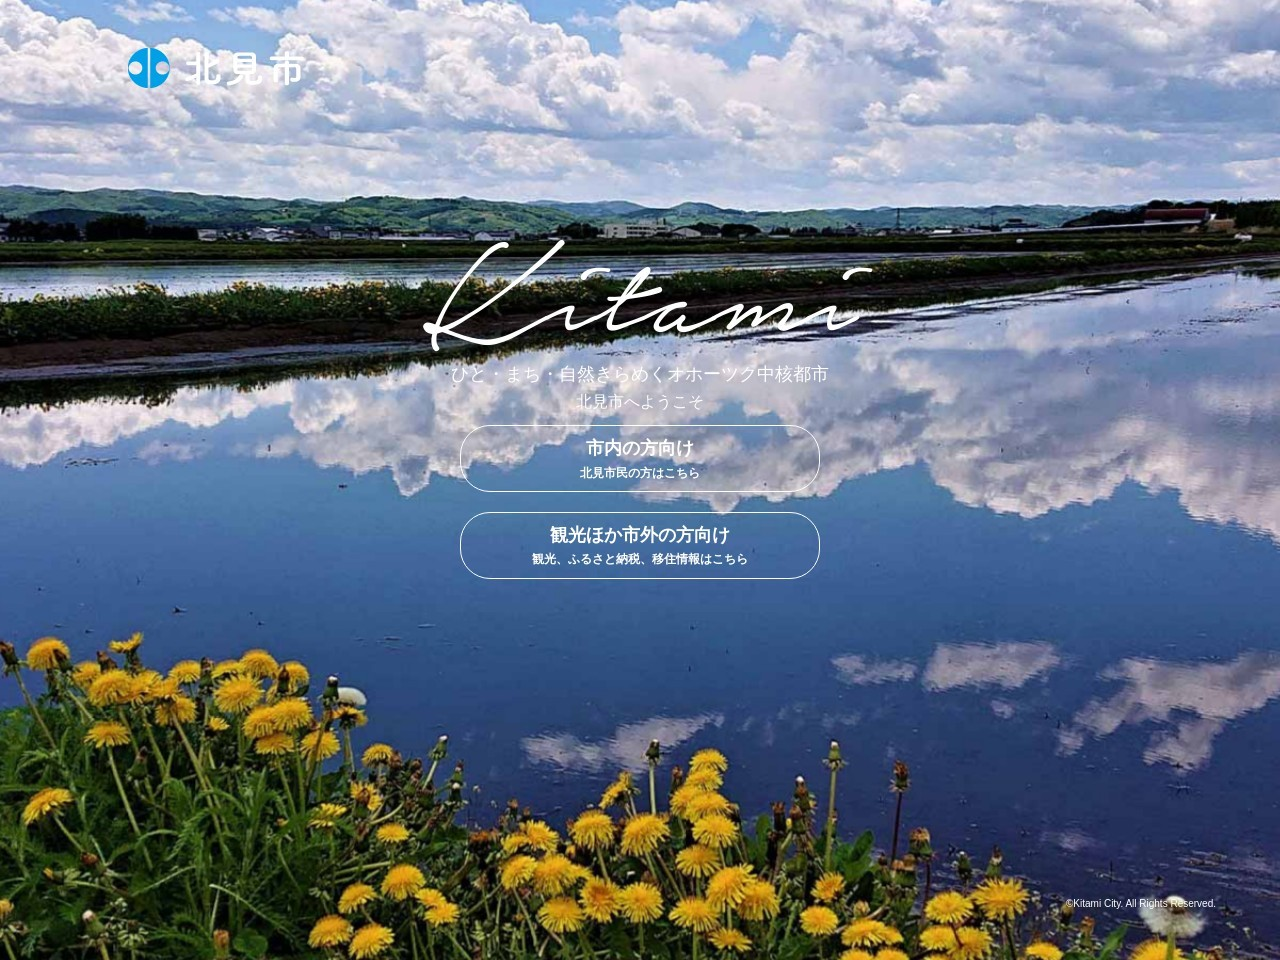 http://www.city.kitami.lg.jp/docs/2018030100018/